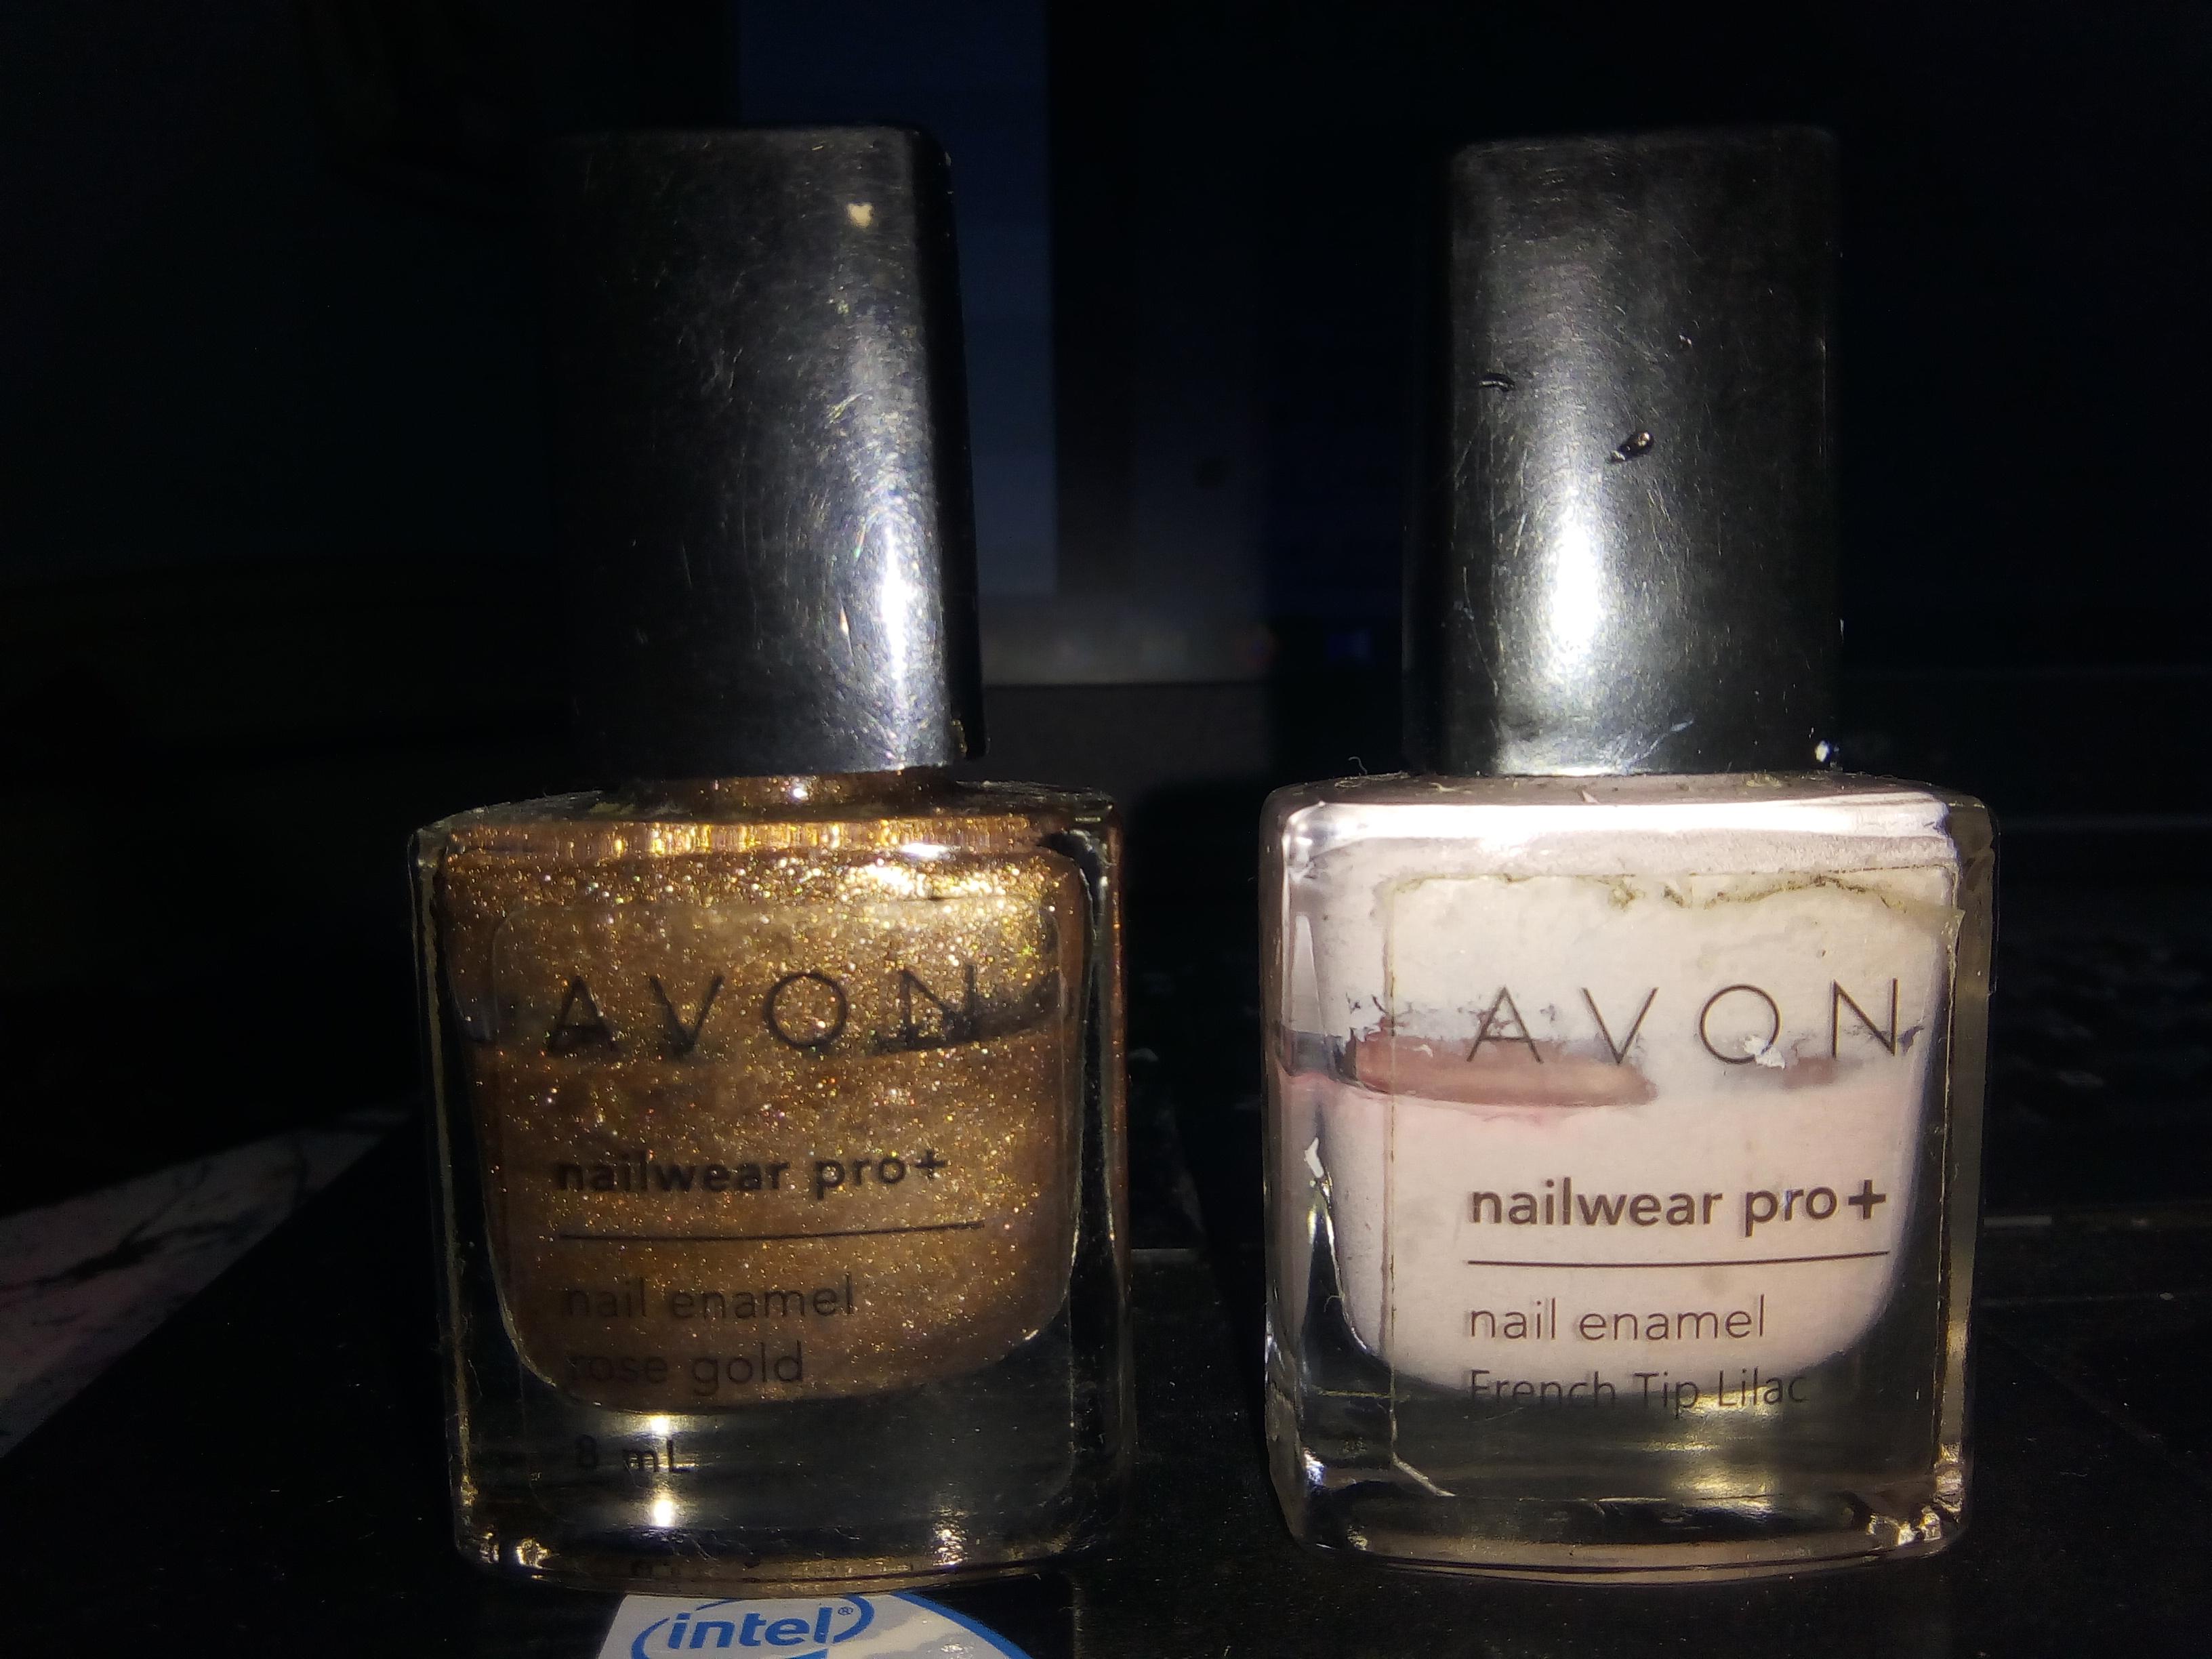 Avon True Color Pro+ Nail Enamel -Avon True Color Pro Nail Enamel-By aneesha